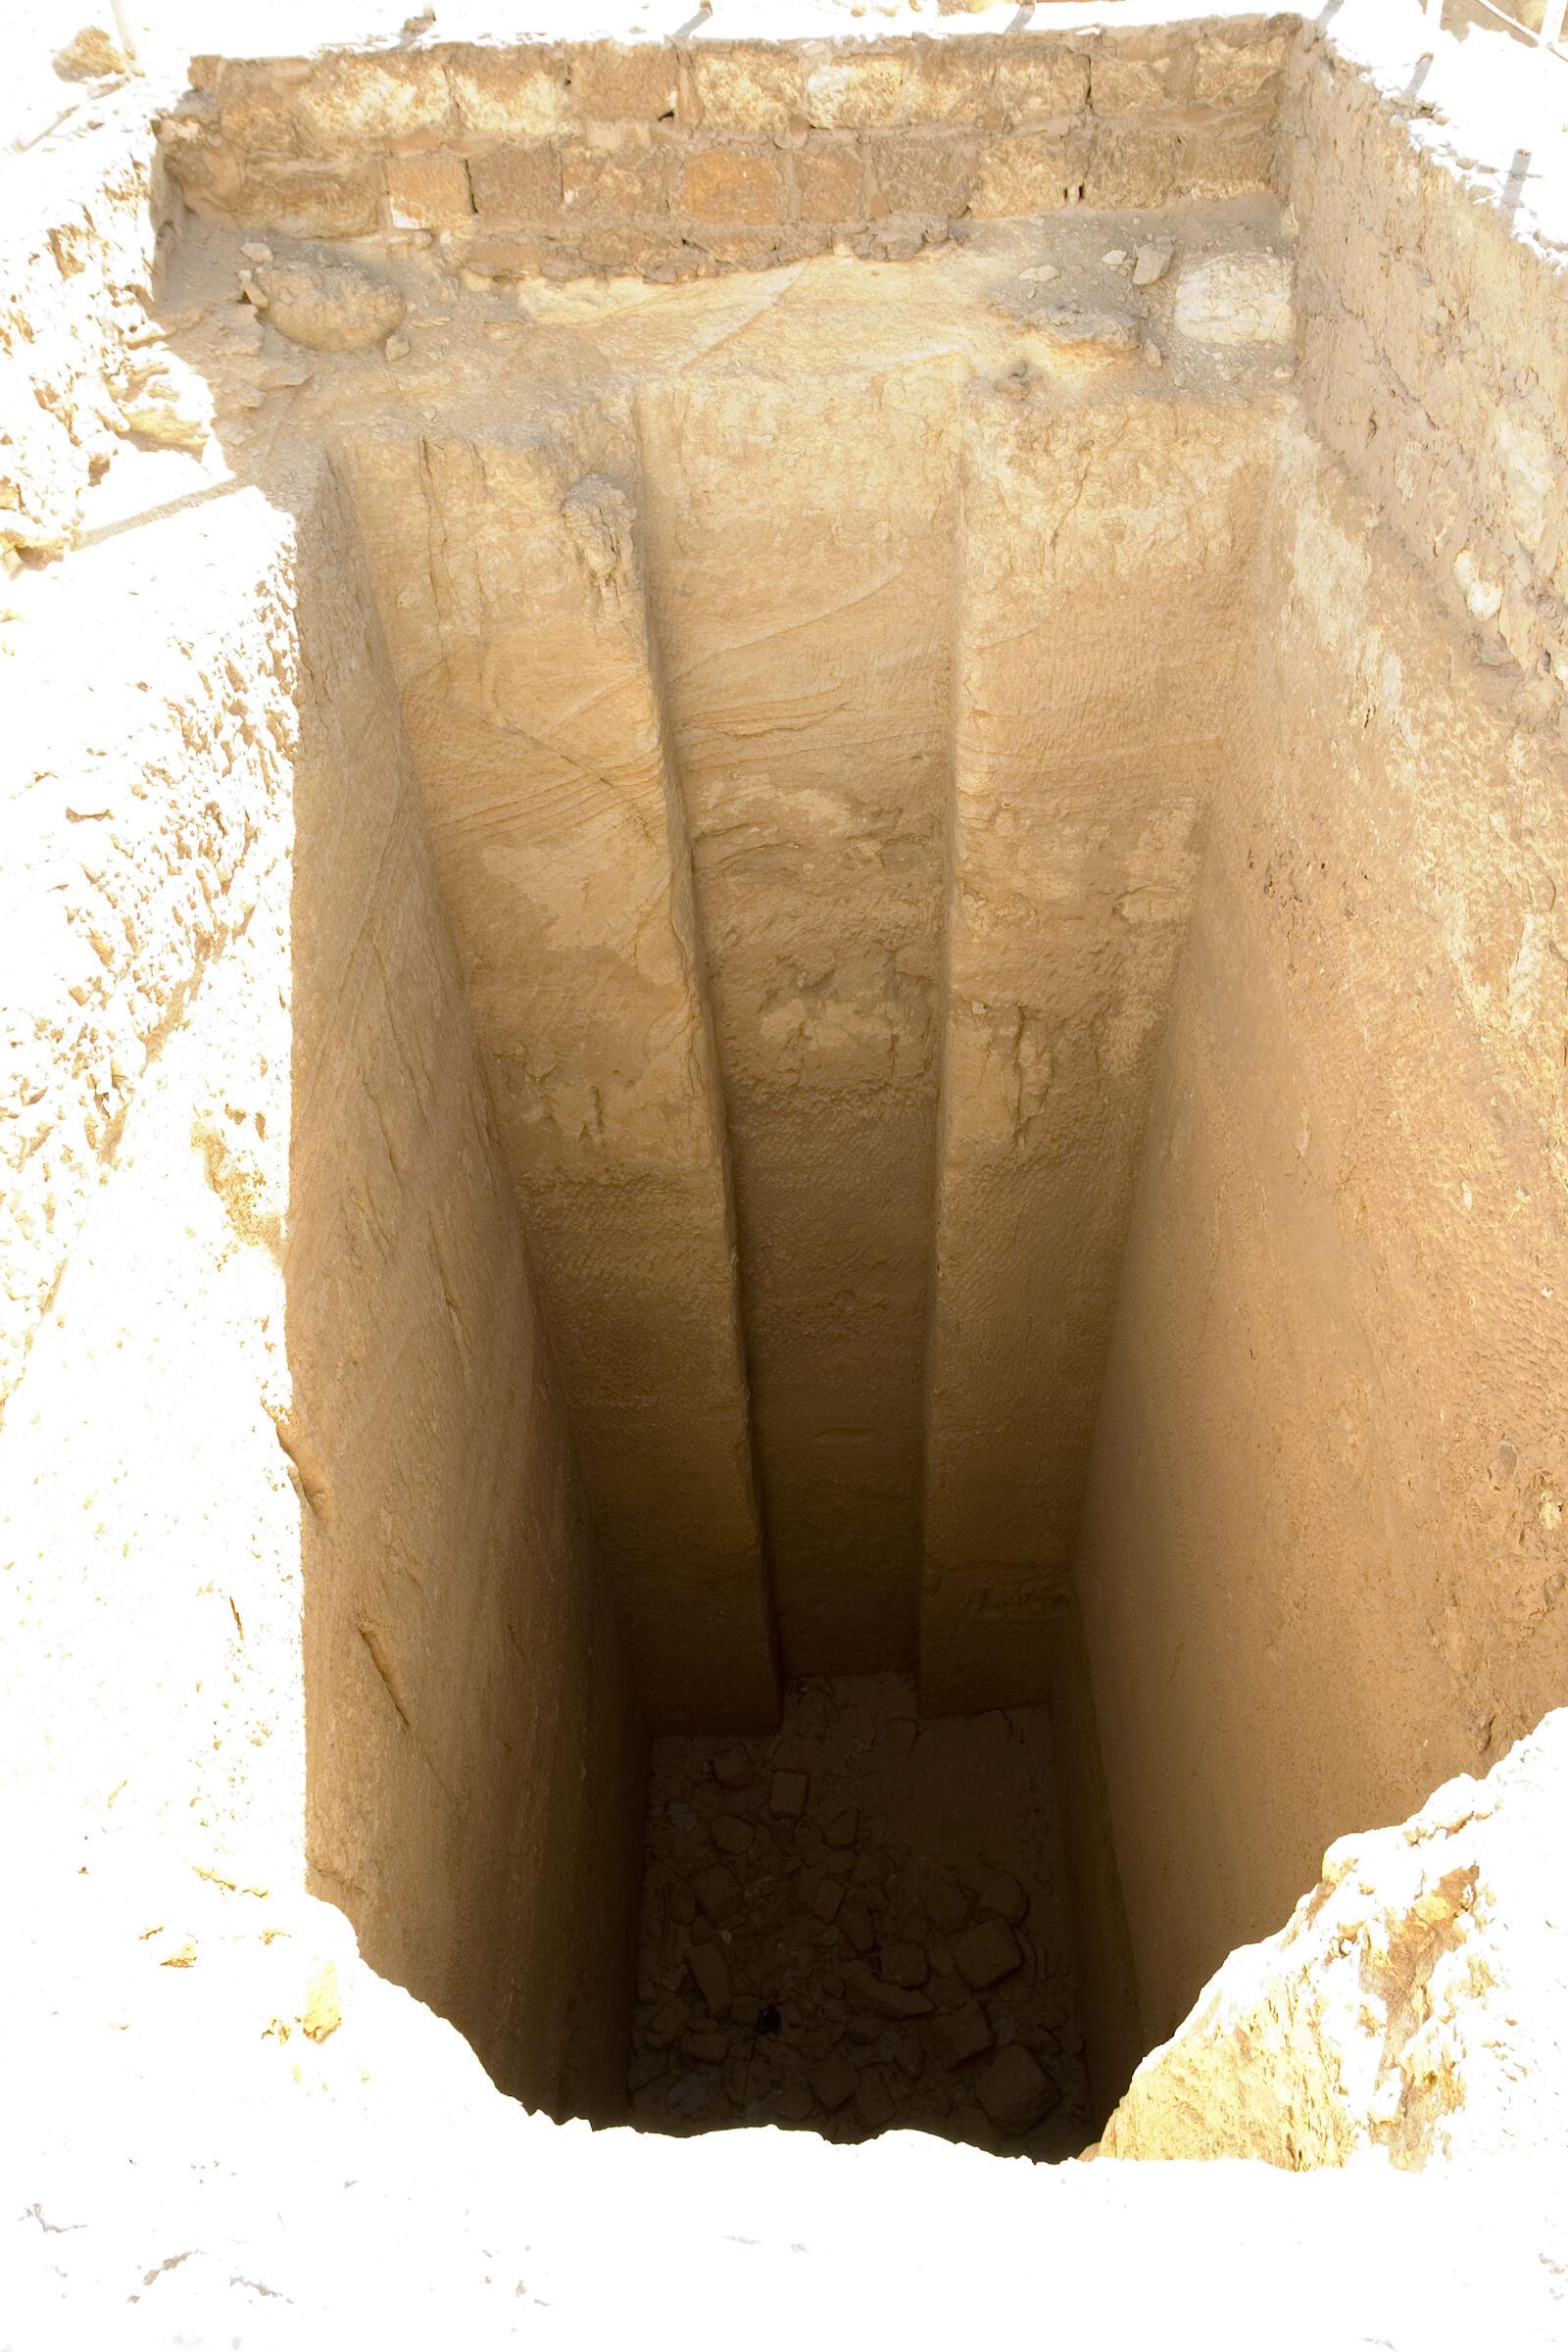 Central Field: Site: Giza; View: Central field